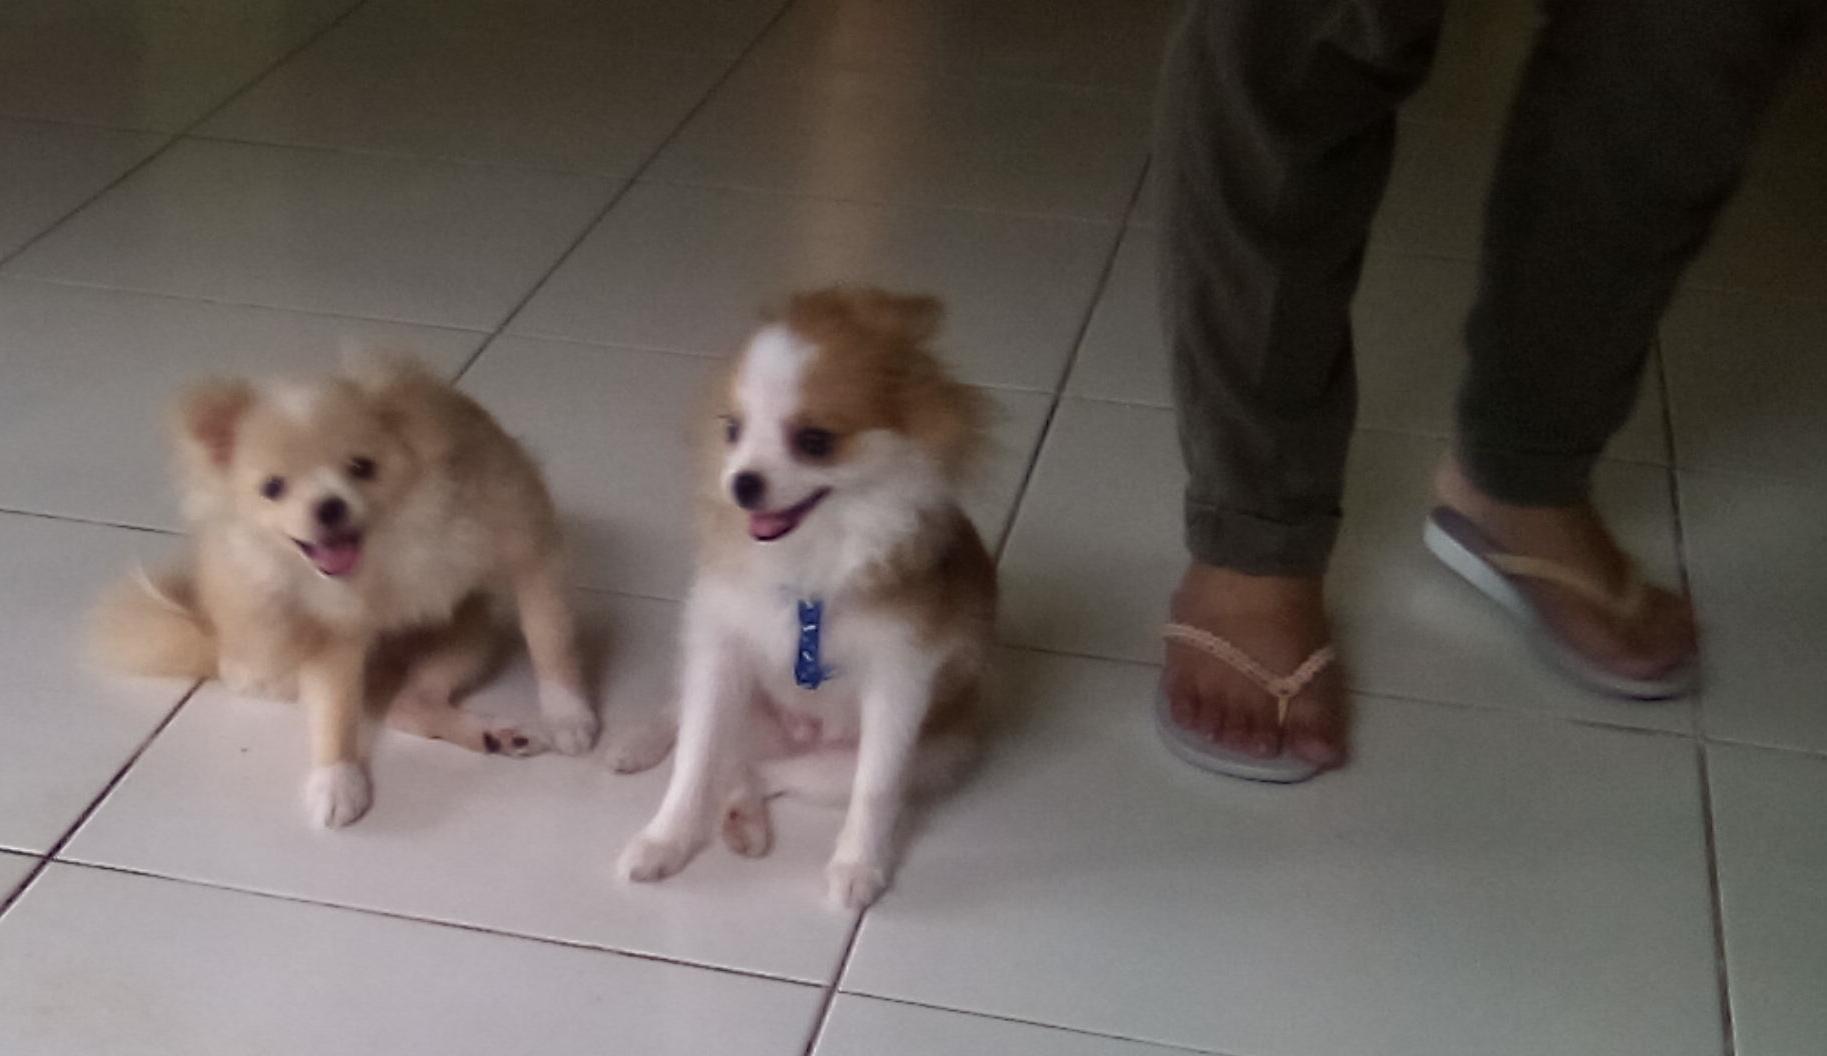 Dogs sitting